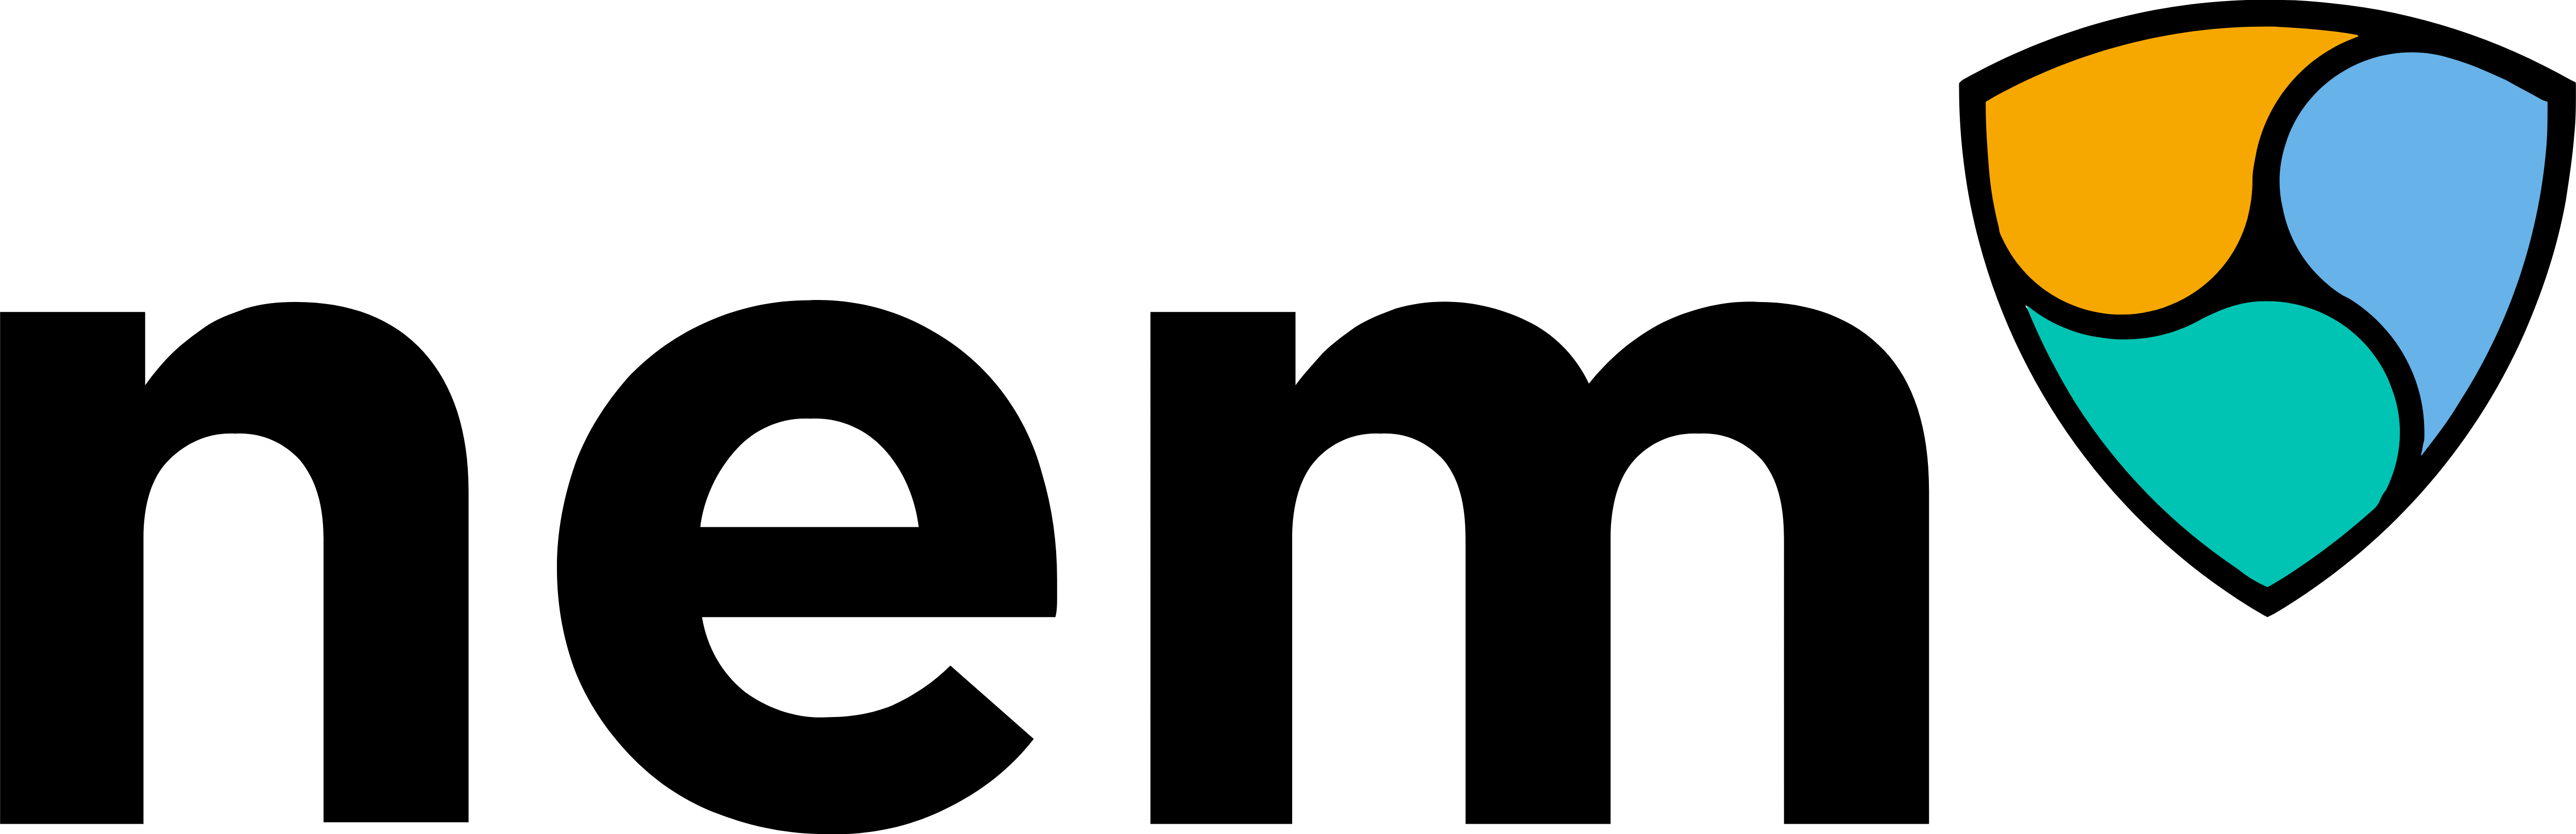 Nem – Logos Download